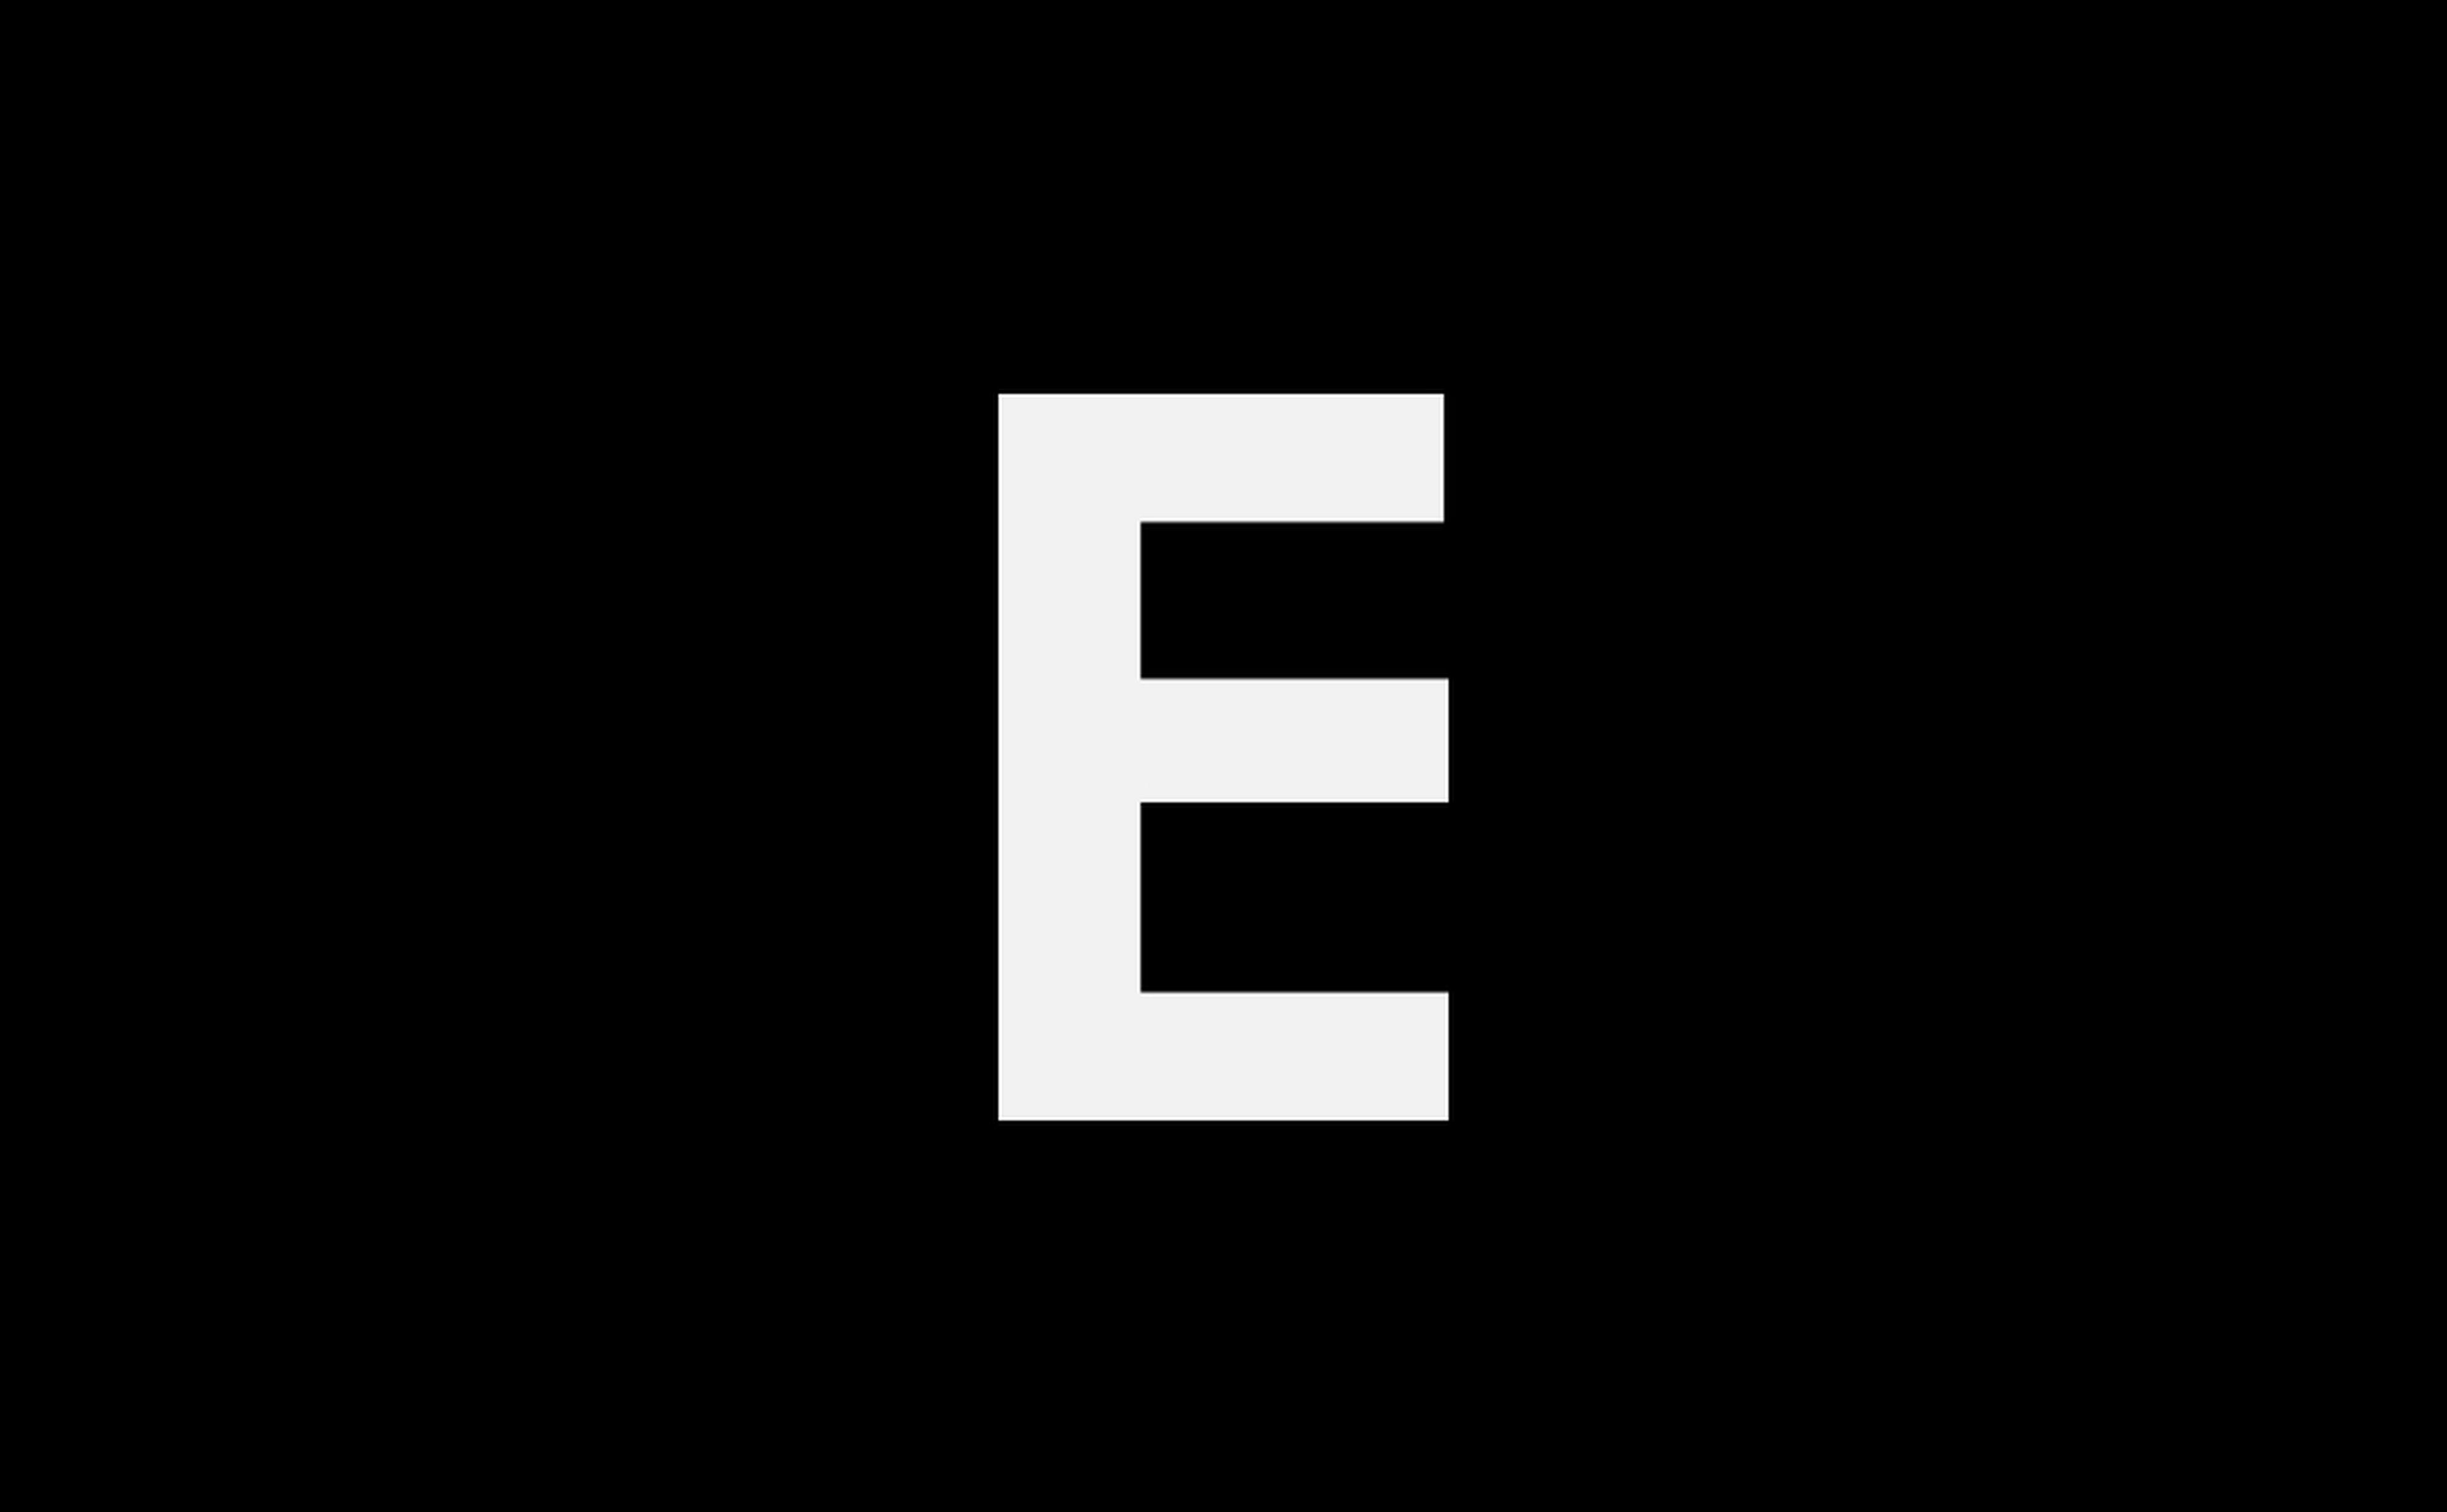 graffiti, text, street art, communication, outdoors, day, no people, architecture, city